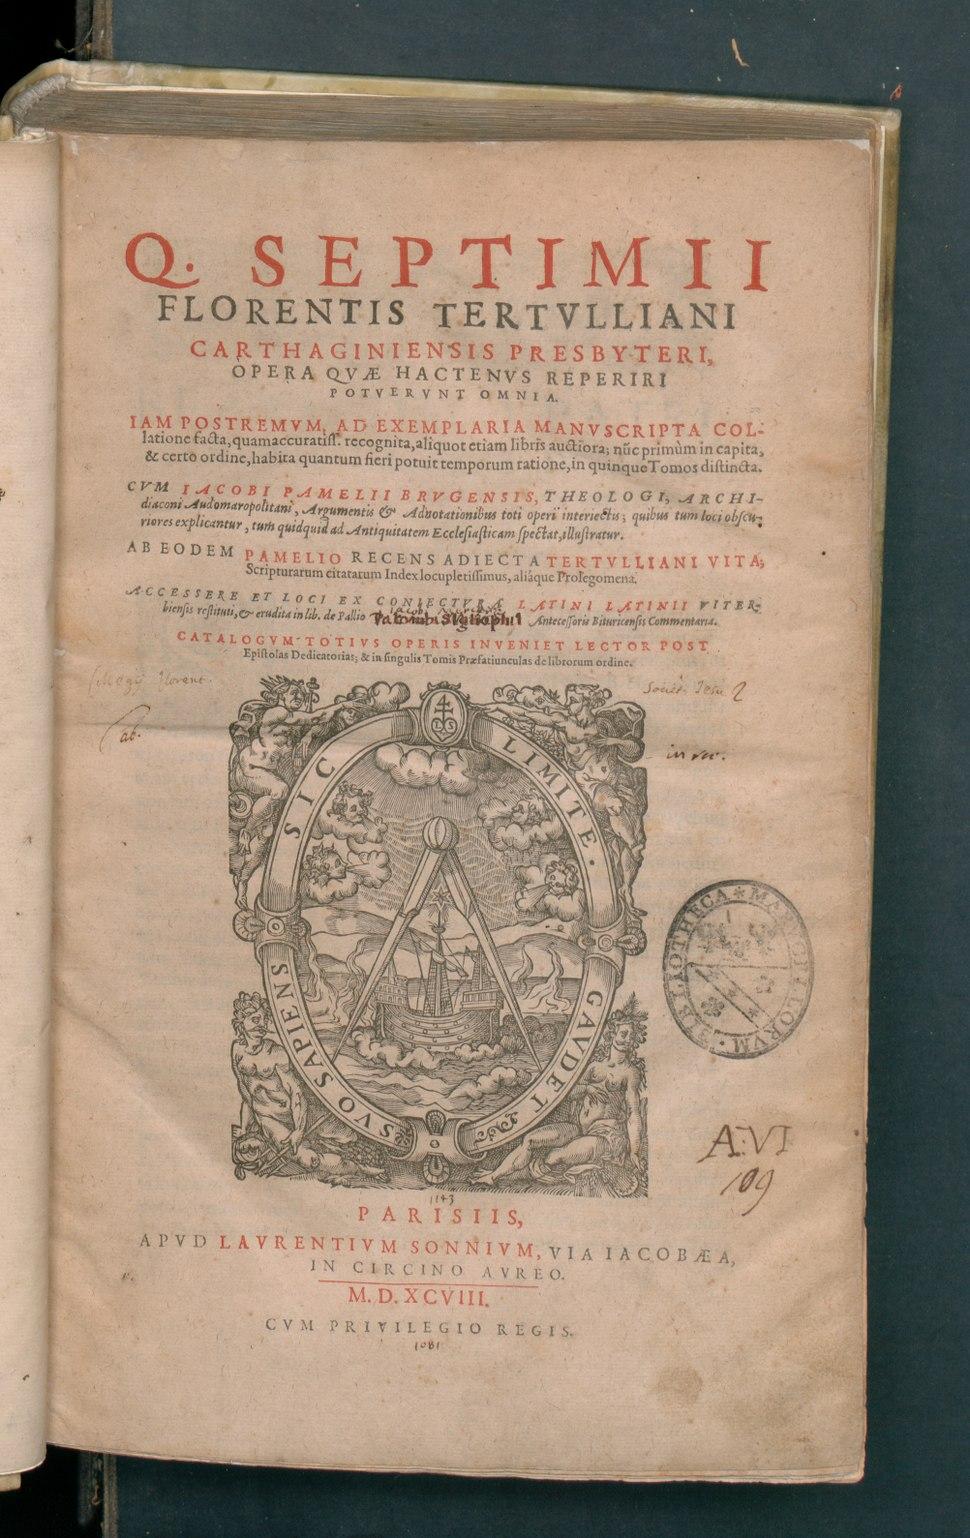 Septimi Florensis Tertulliani Opera